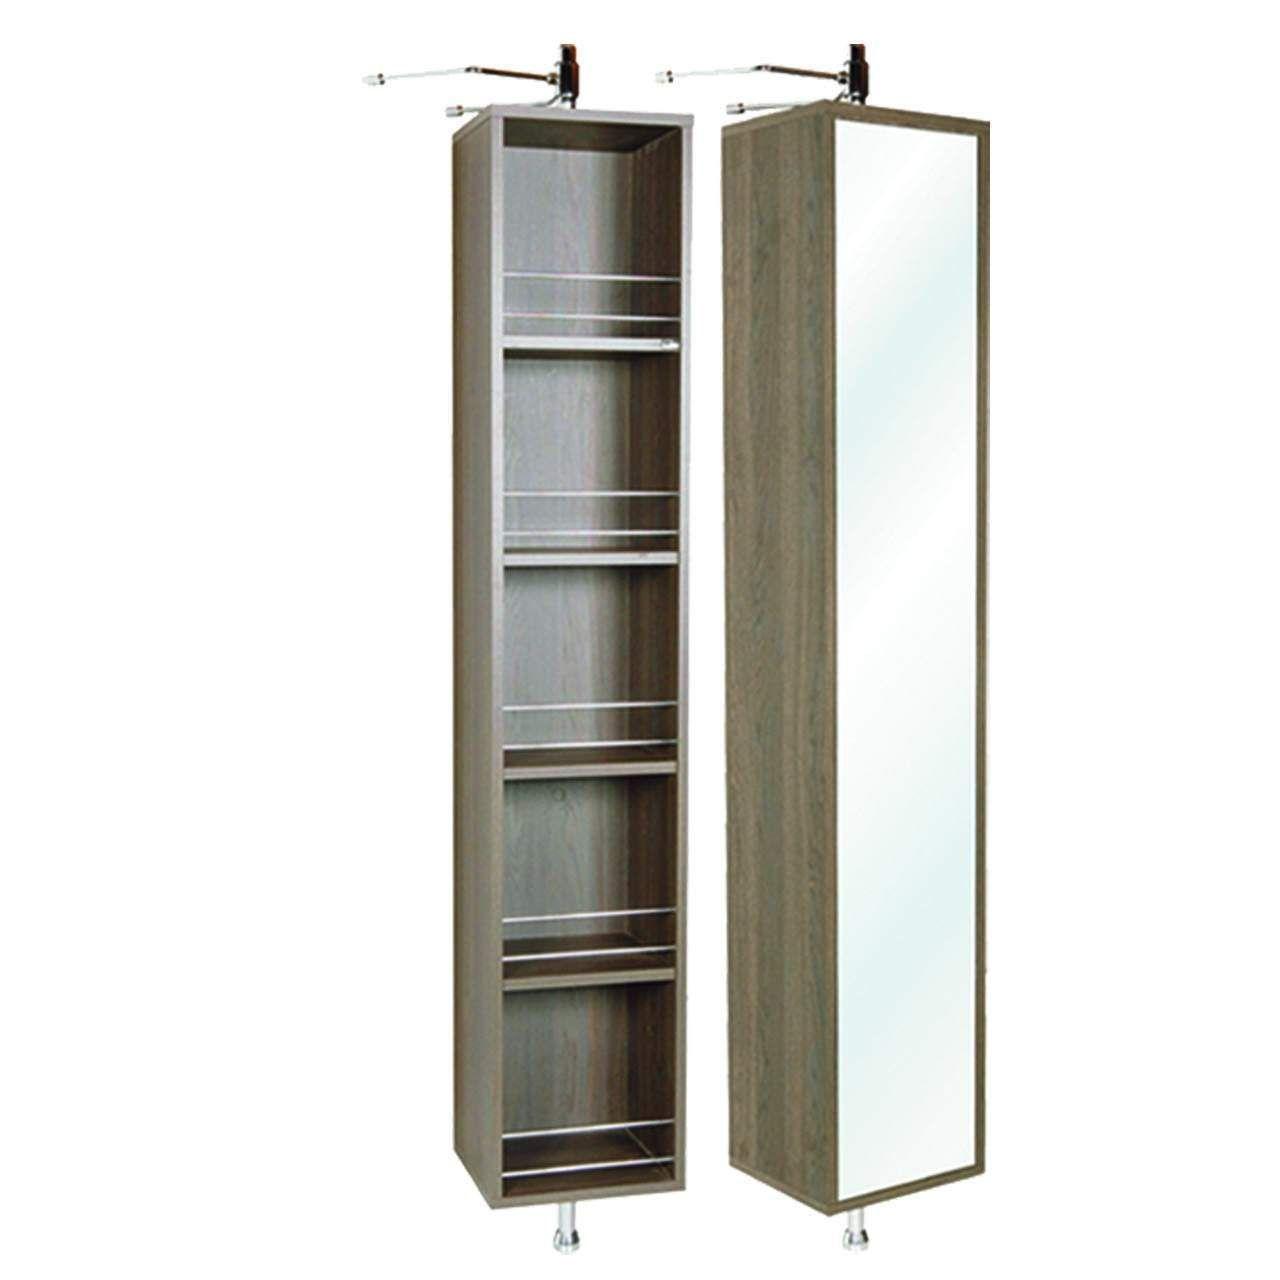 Revolving bathroom cabinet - Rotating Bath Mirror With Shelf Google Search